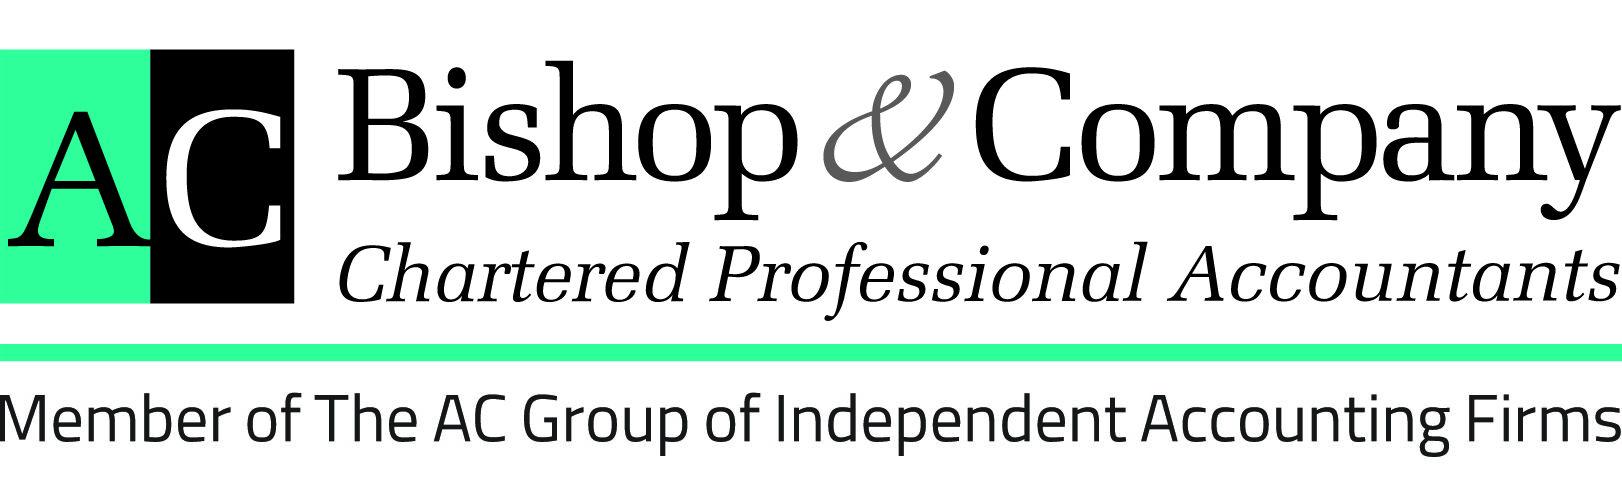 Bishop & Company Chartered Professional Accountants Inc logo